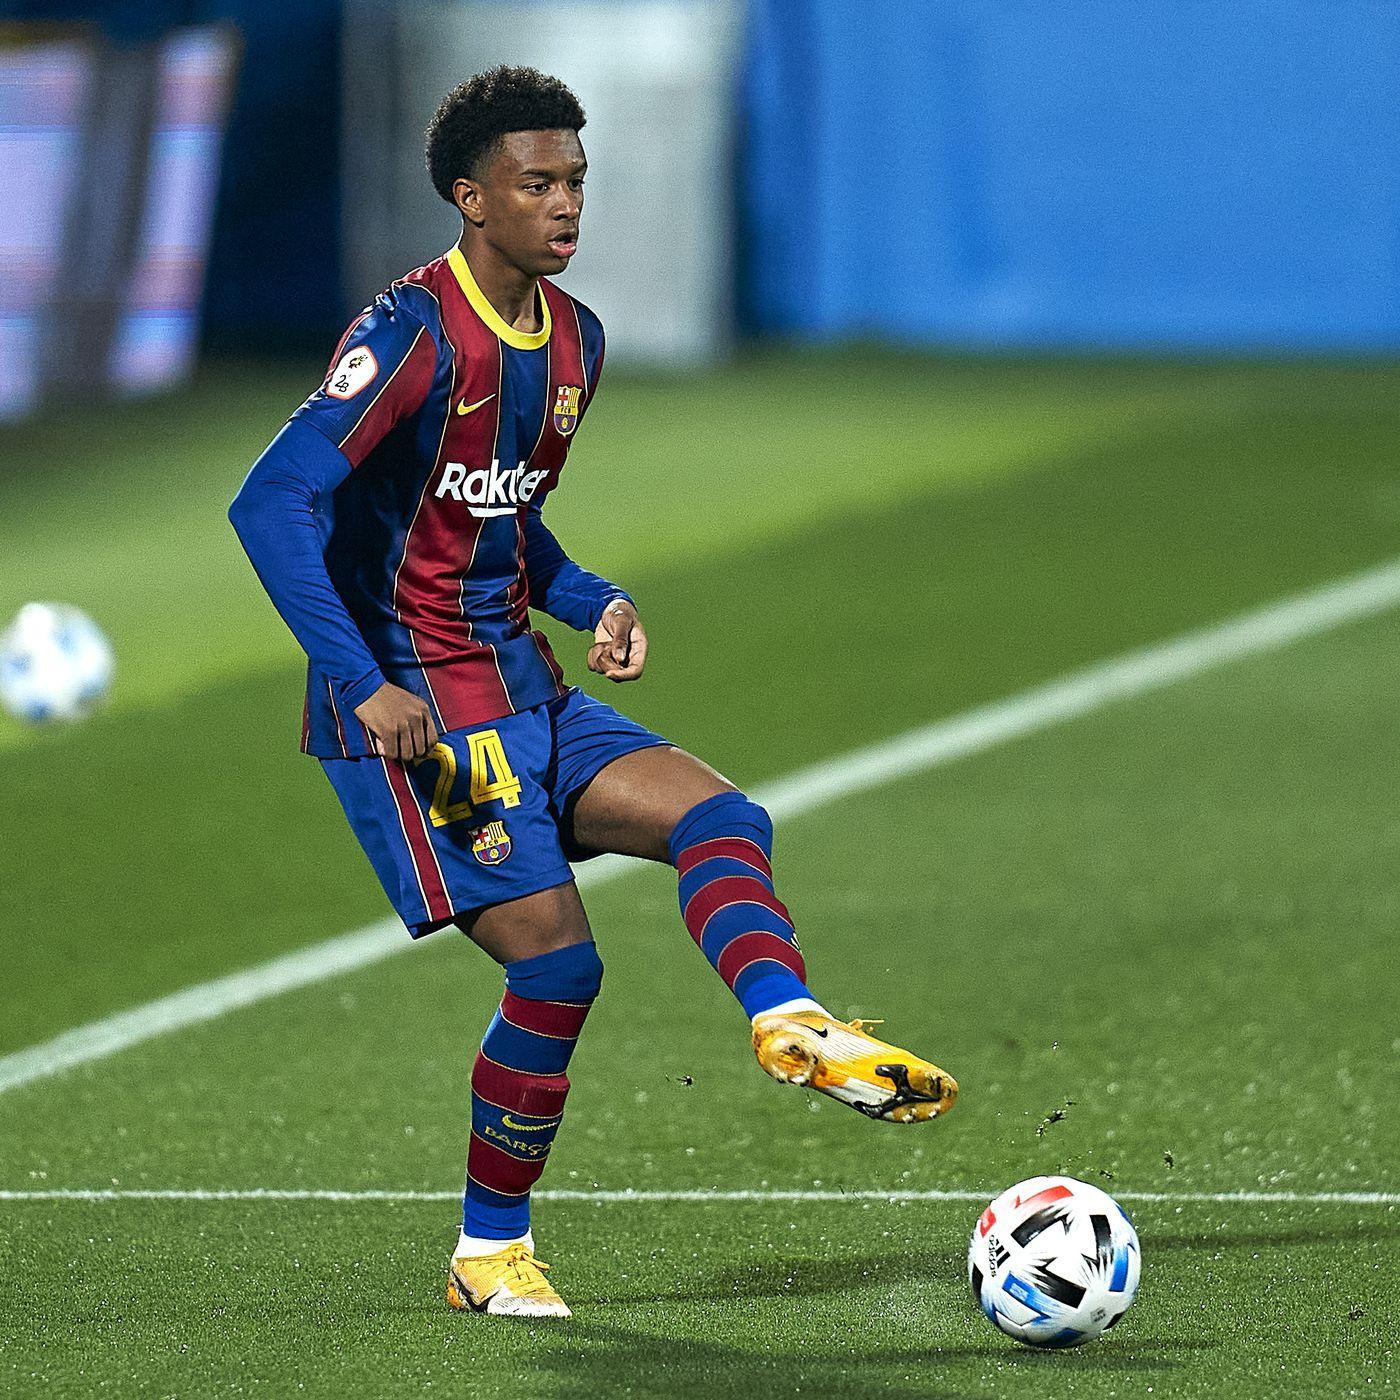 Alejandro Balde gets chance to impress at Barcelona pre-season training -  Barca Blaugranes